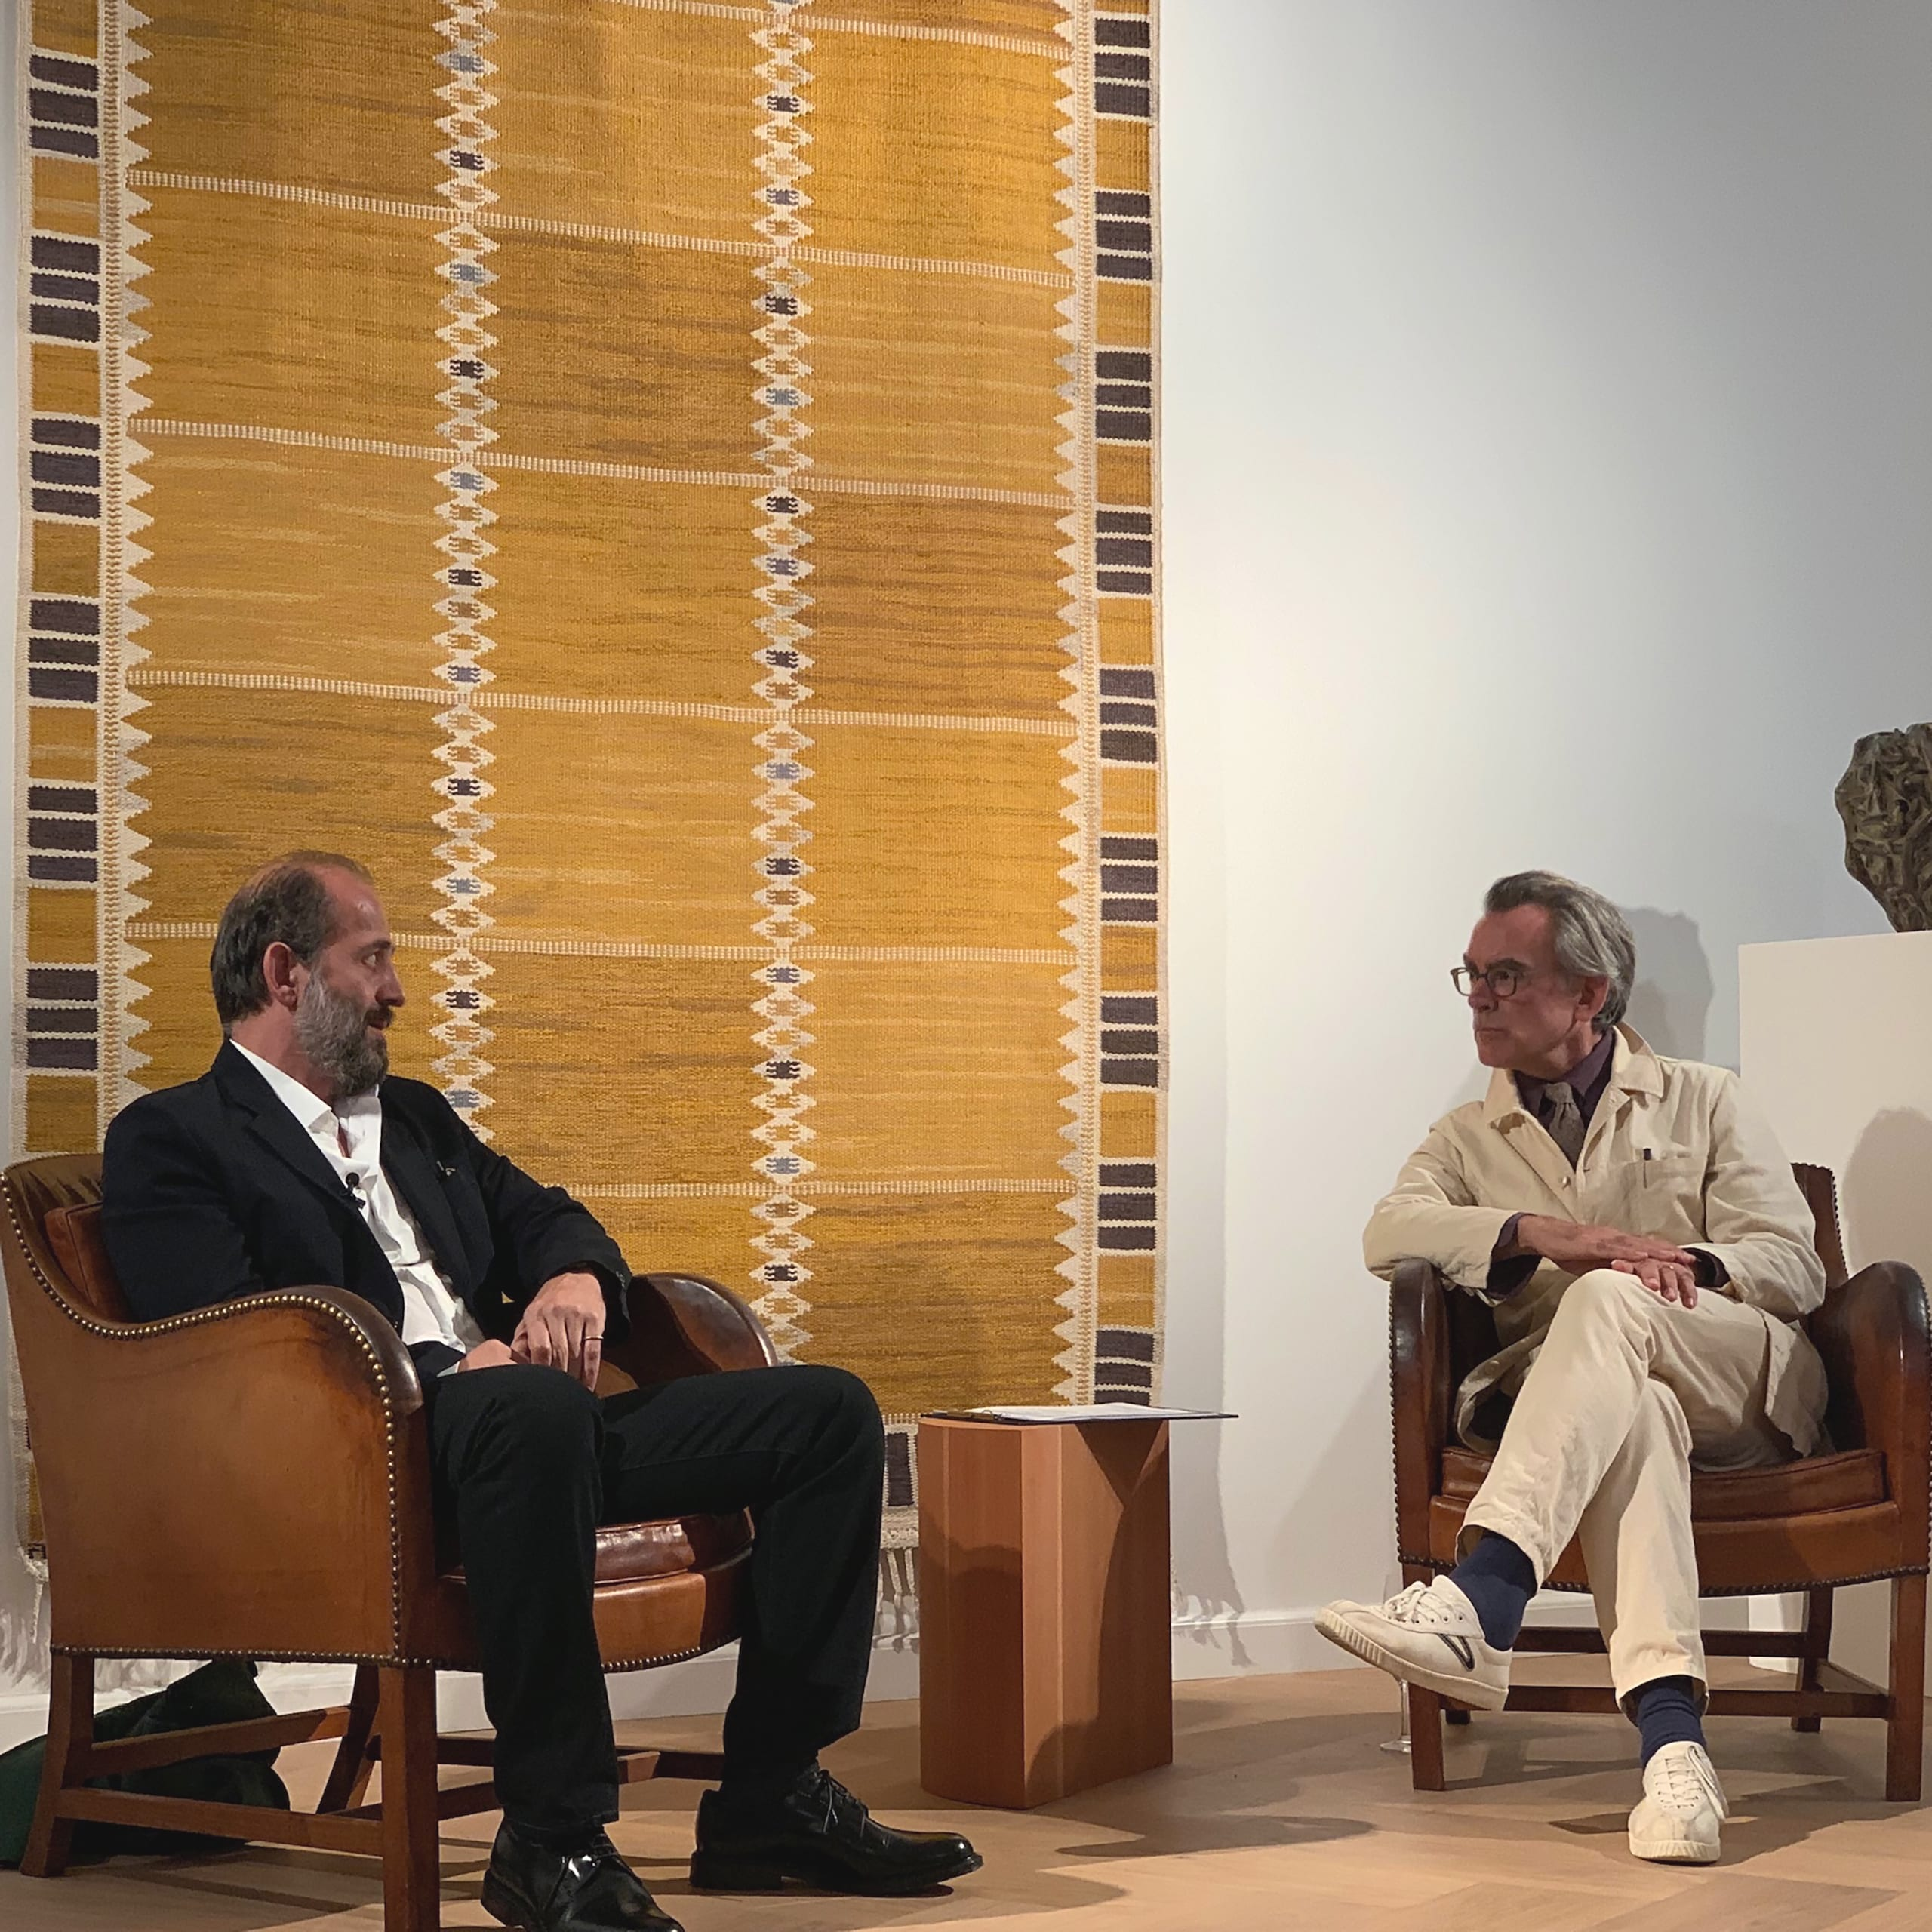 Copenhagen Gallery - Design talk with Michael Anastassiades and Mark Isitt